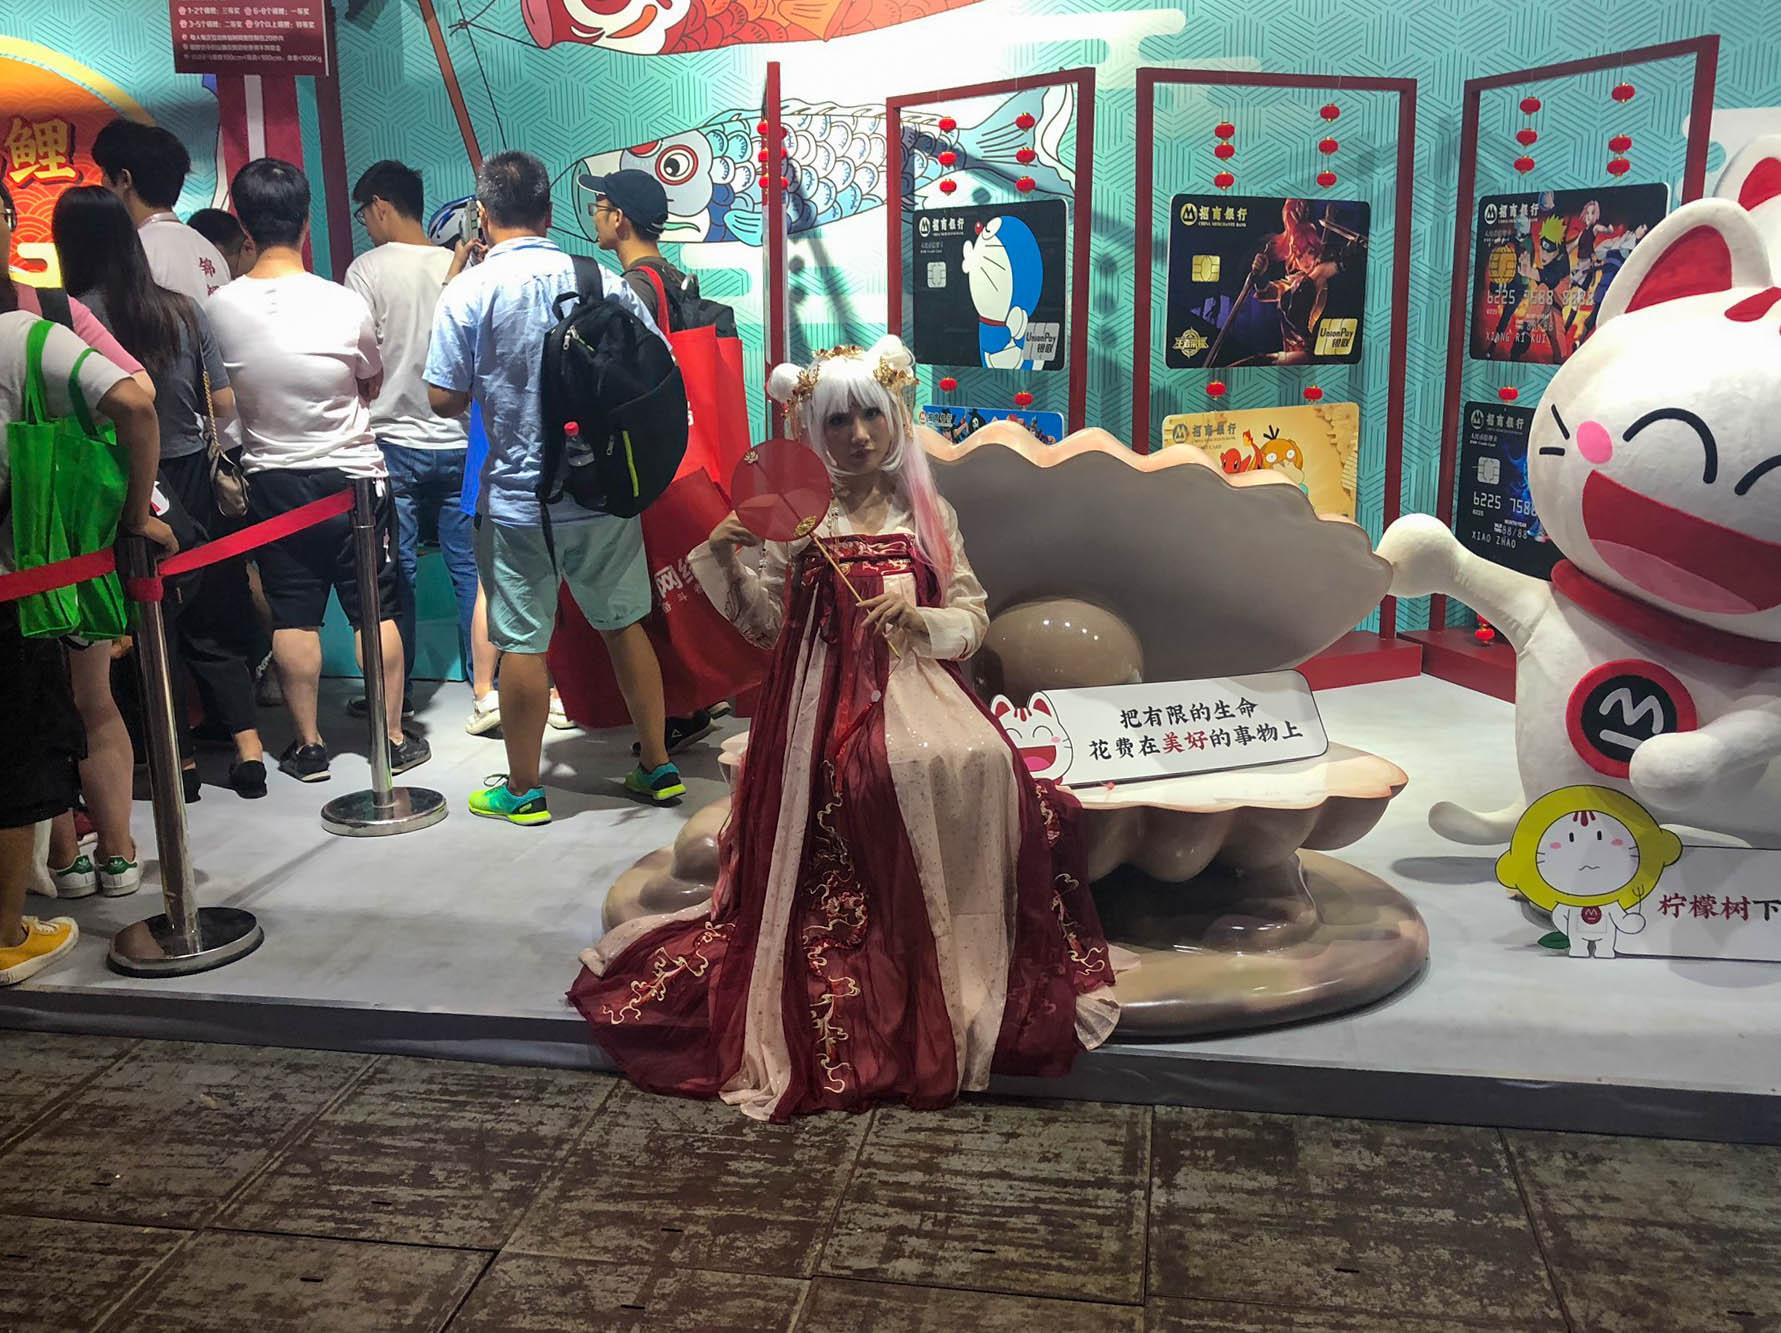 2019 ChinaJoy 中国国际数码互动娱乐展览会 游玩 第48张